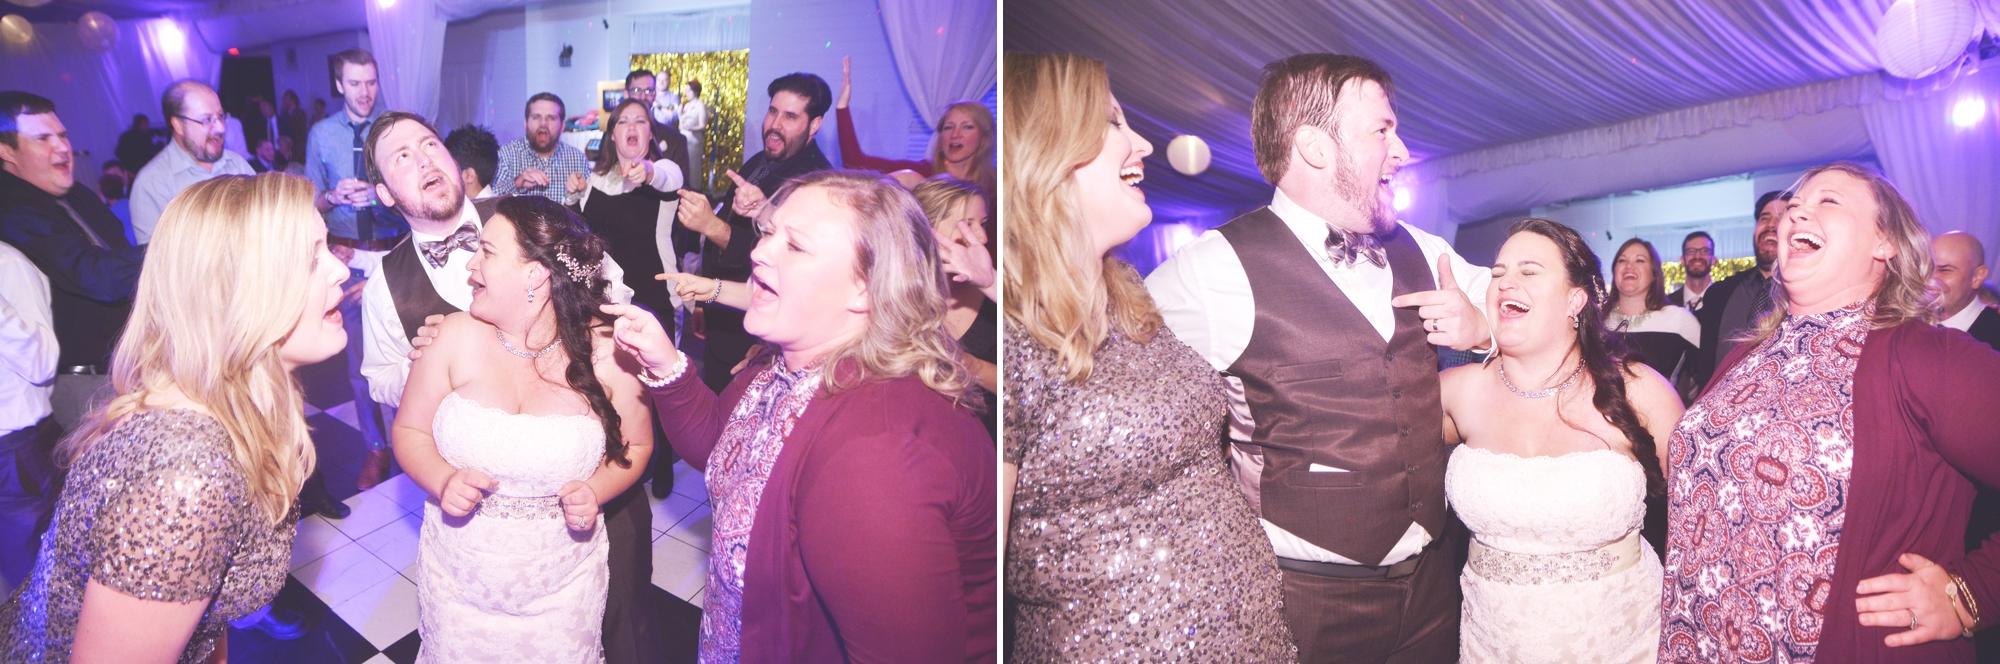 wedding-at-park-tavern-at-piedmont-park-six-hearts-photography053